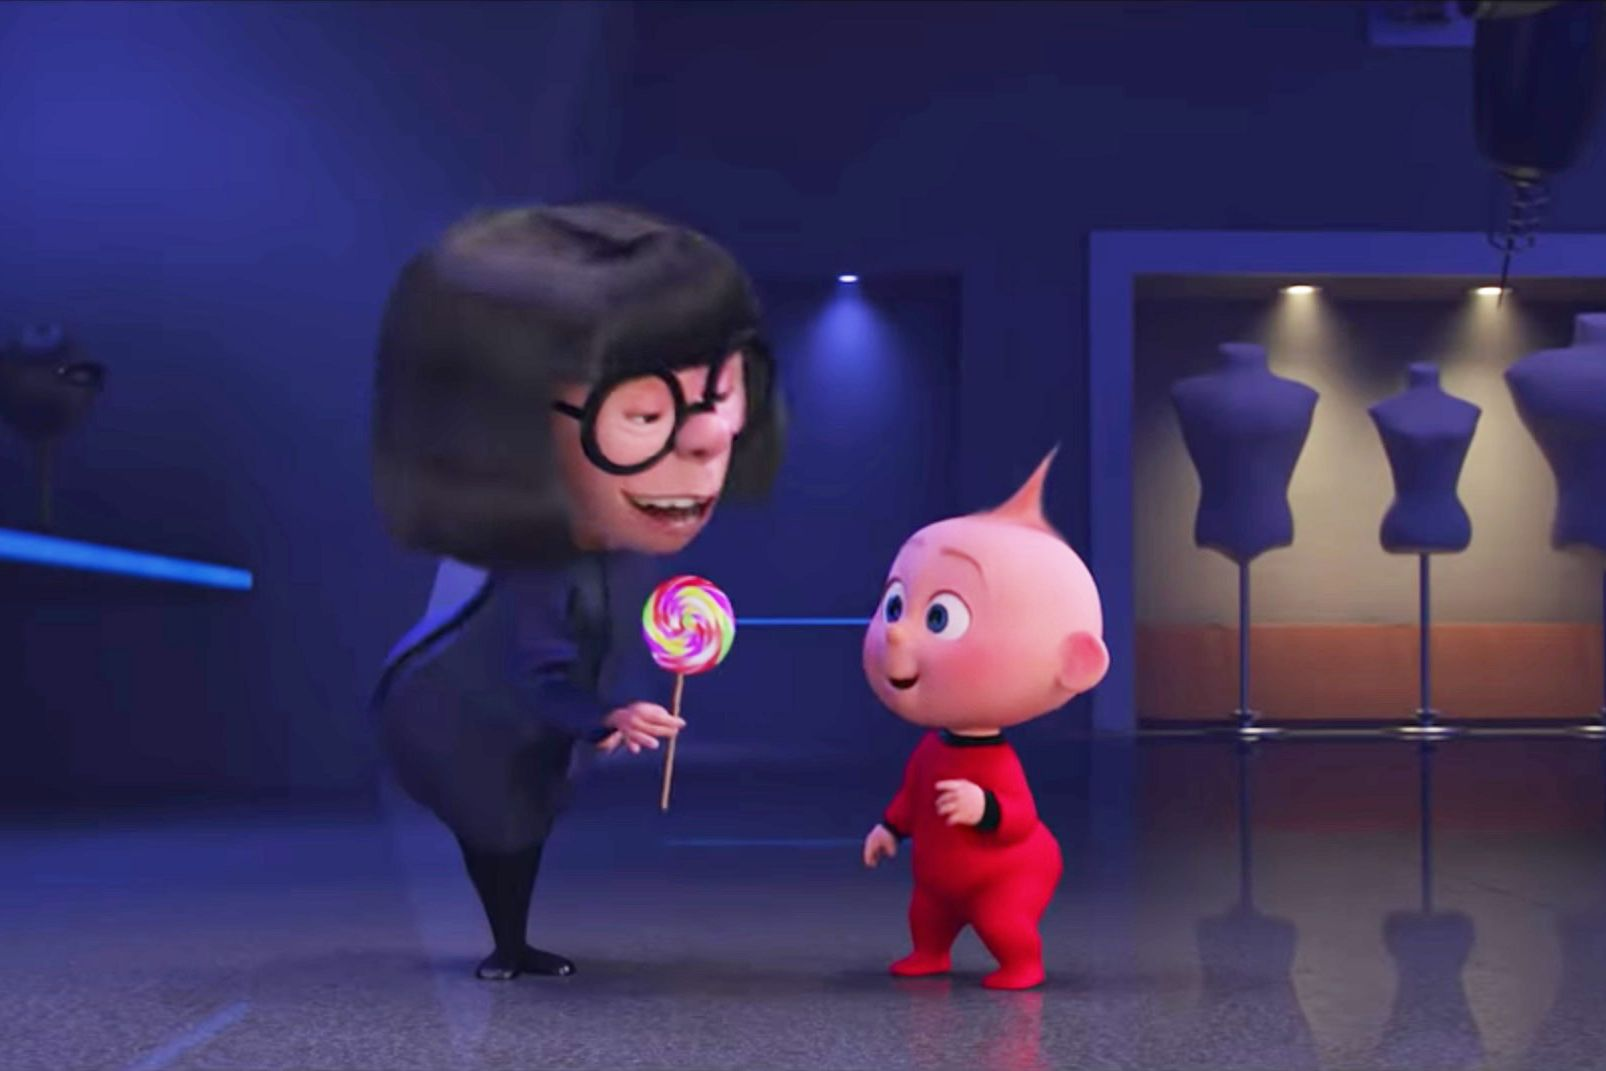 Edna Mose, Baby Jack-Jack, Incredibles 2 deleted scene